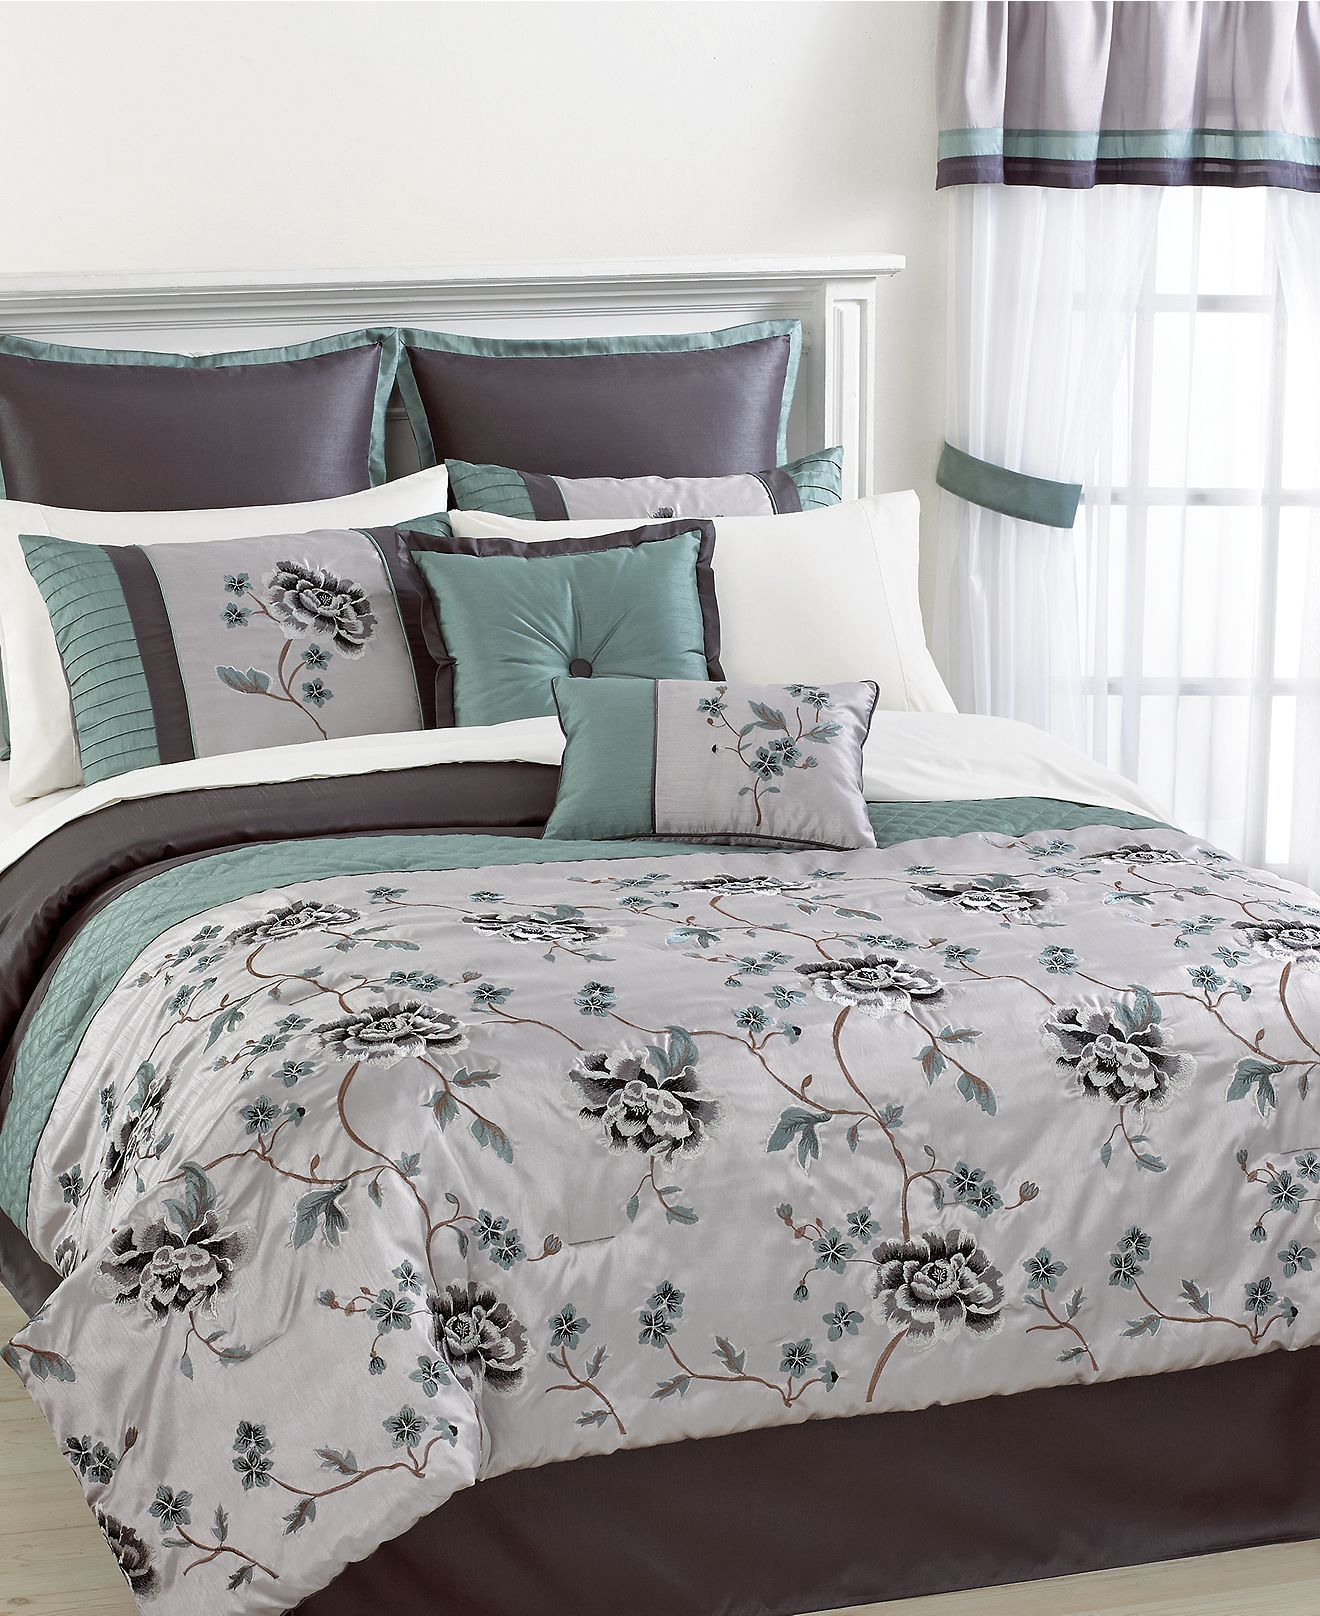 Sonatina 24 Piece California King Comforter Set Bed in a